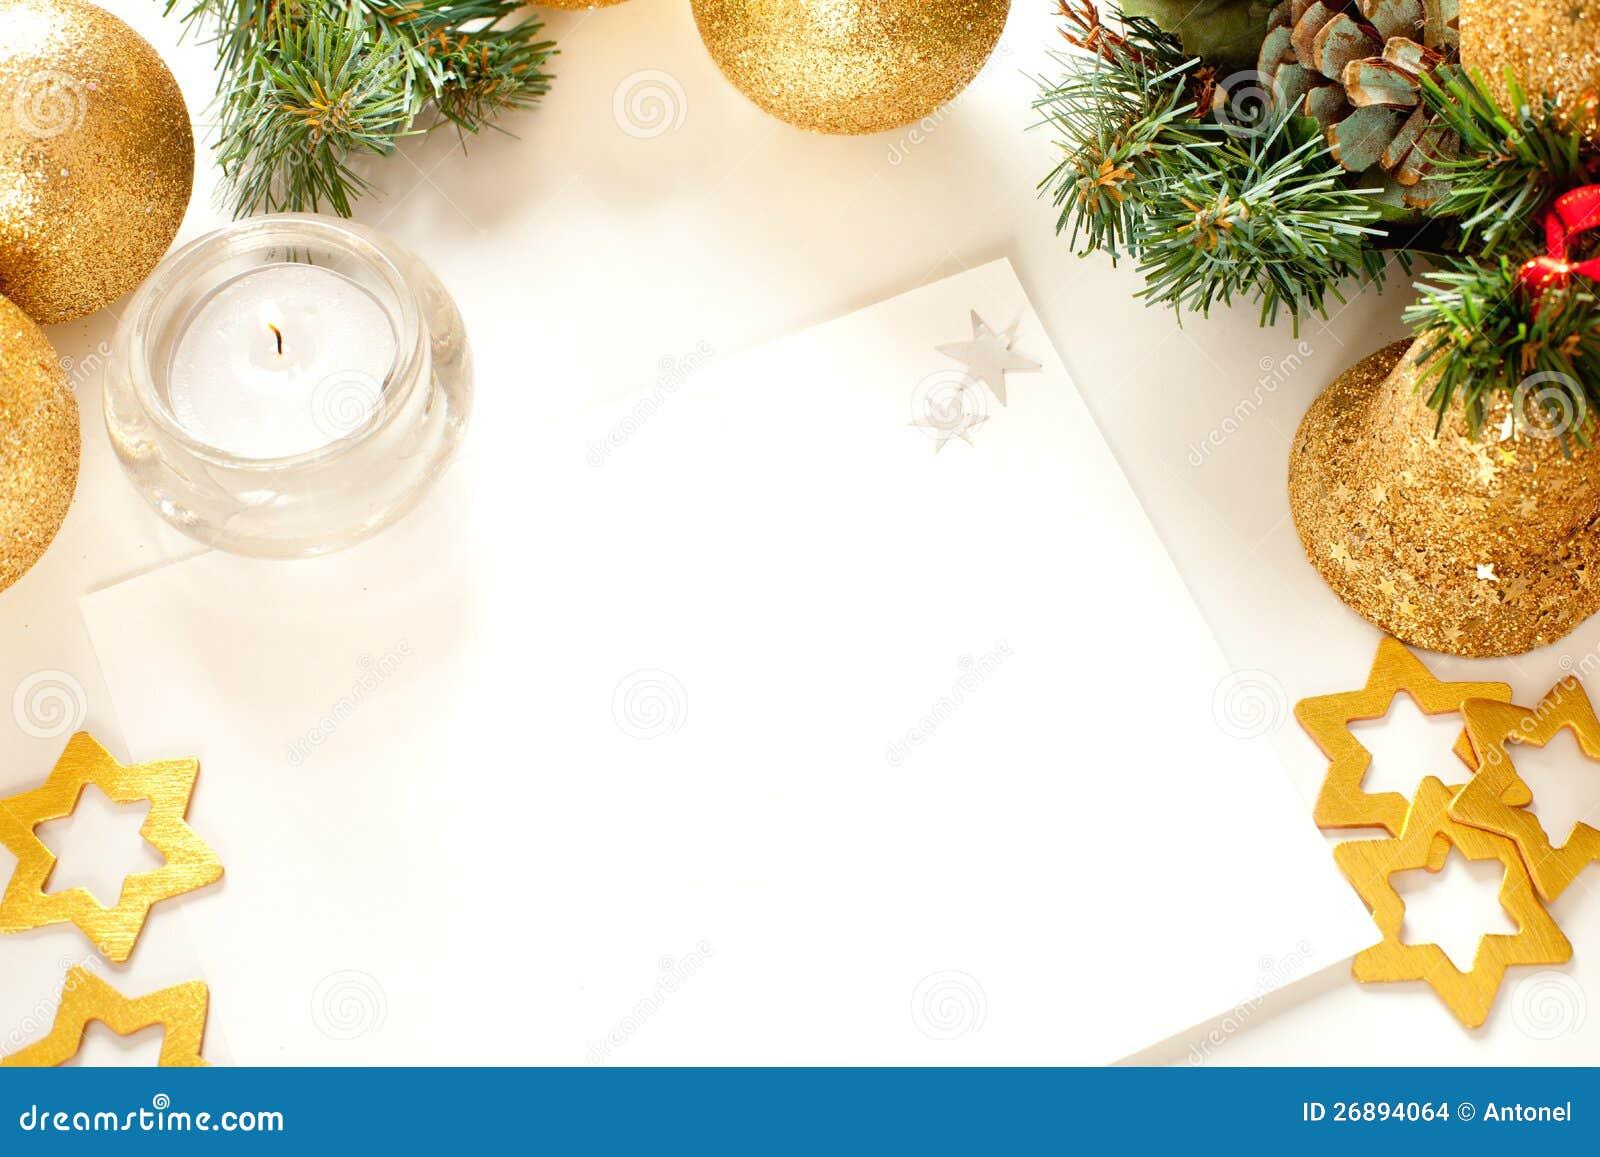 Marco de la navidad para la tarjeta de felicitaci n - Tarjetas felicitacion navidad ...